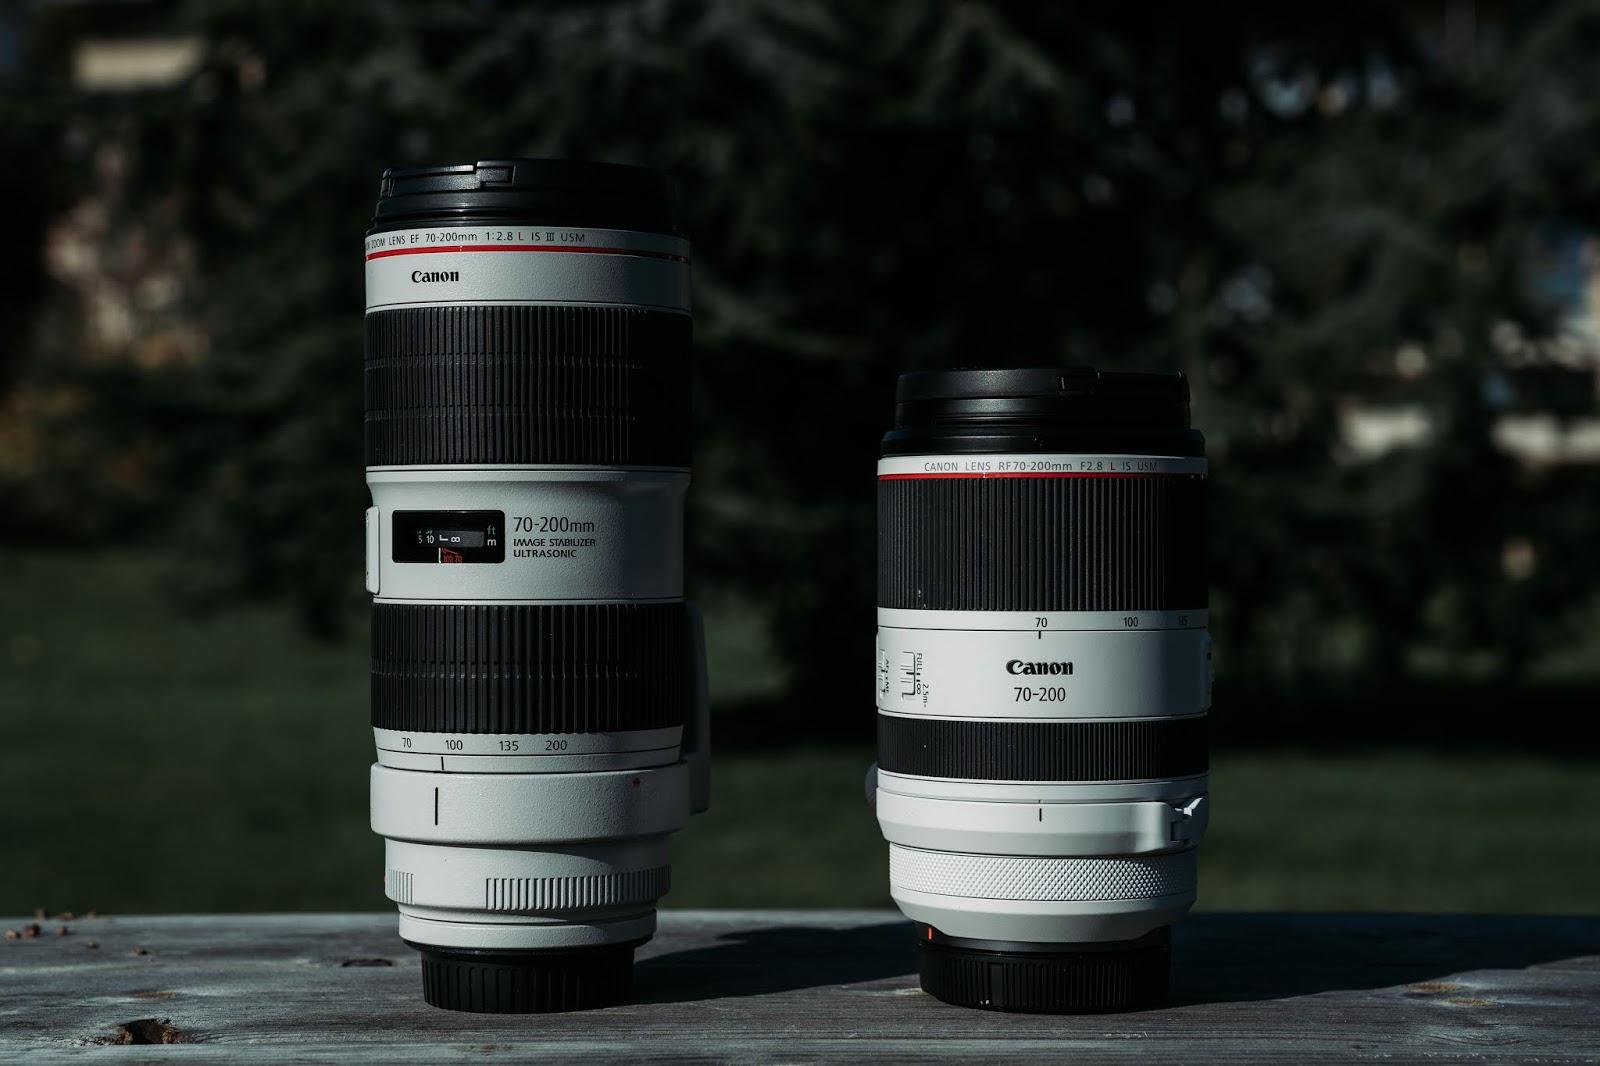 Two new Canon RF Lenses